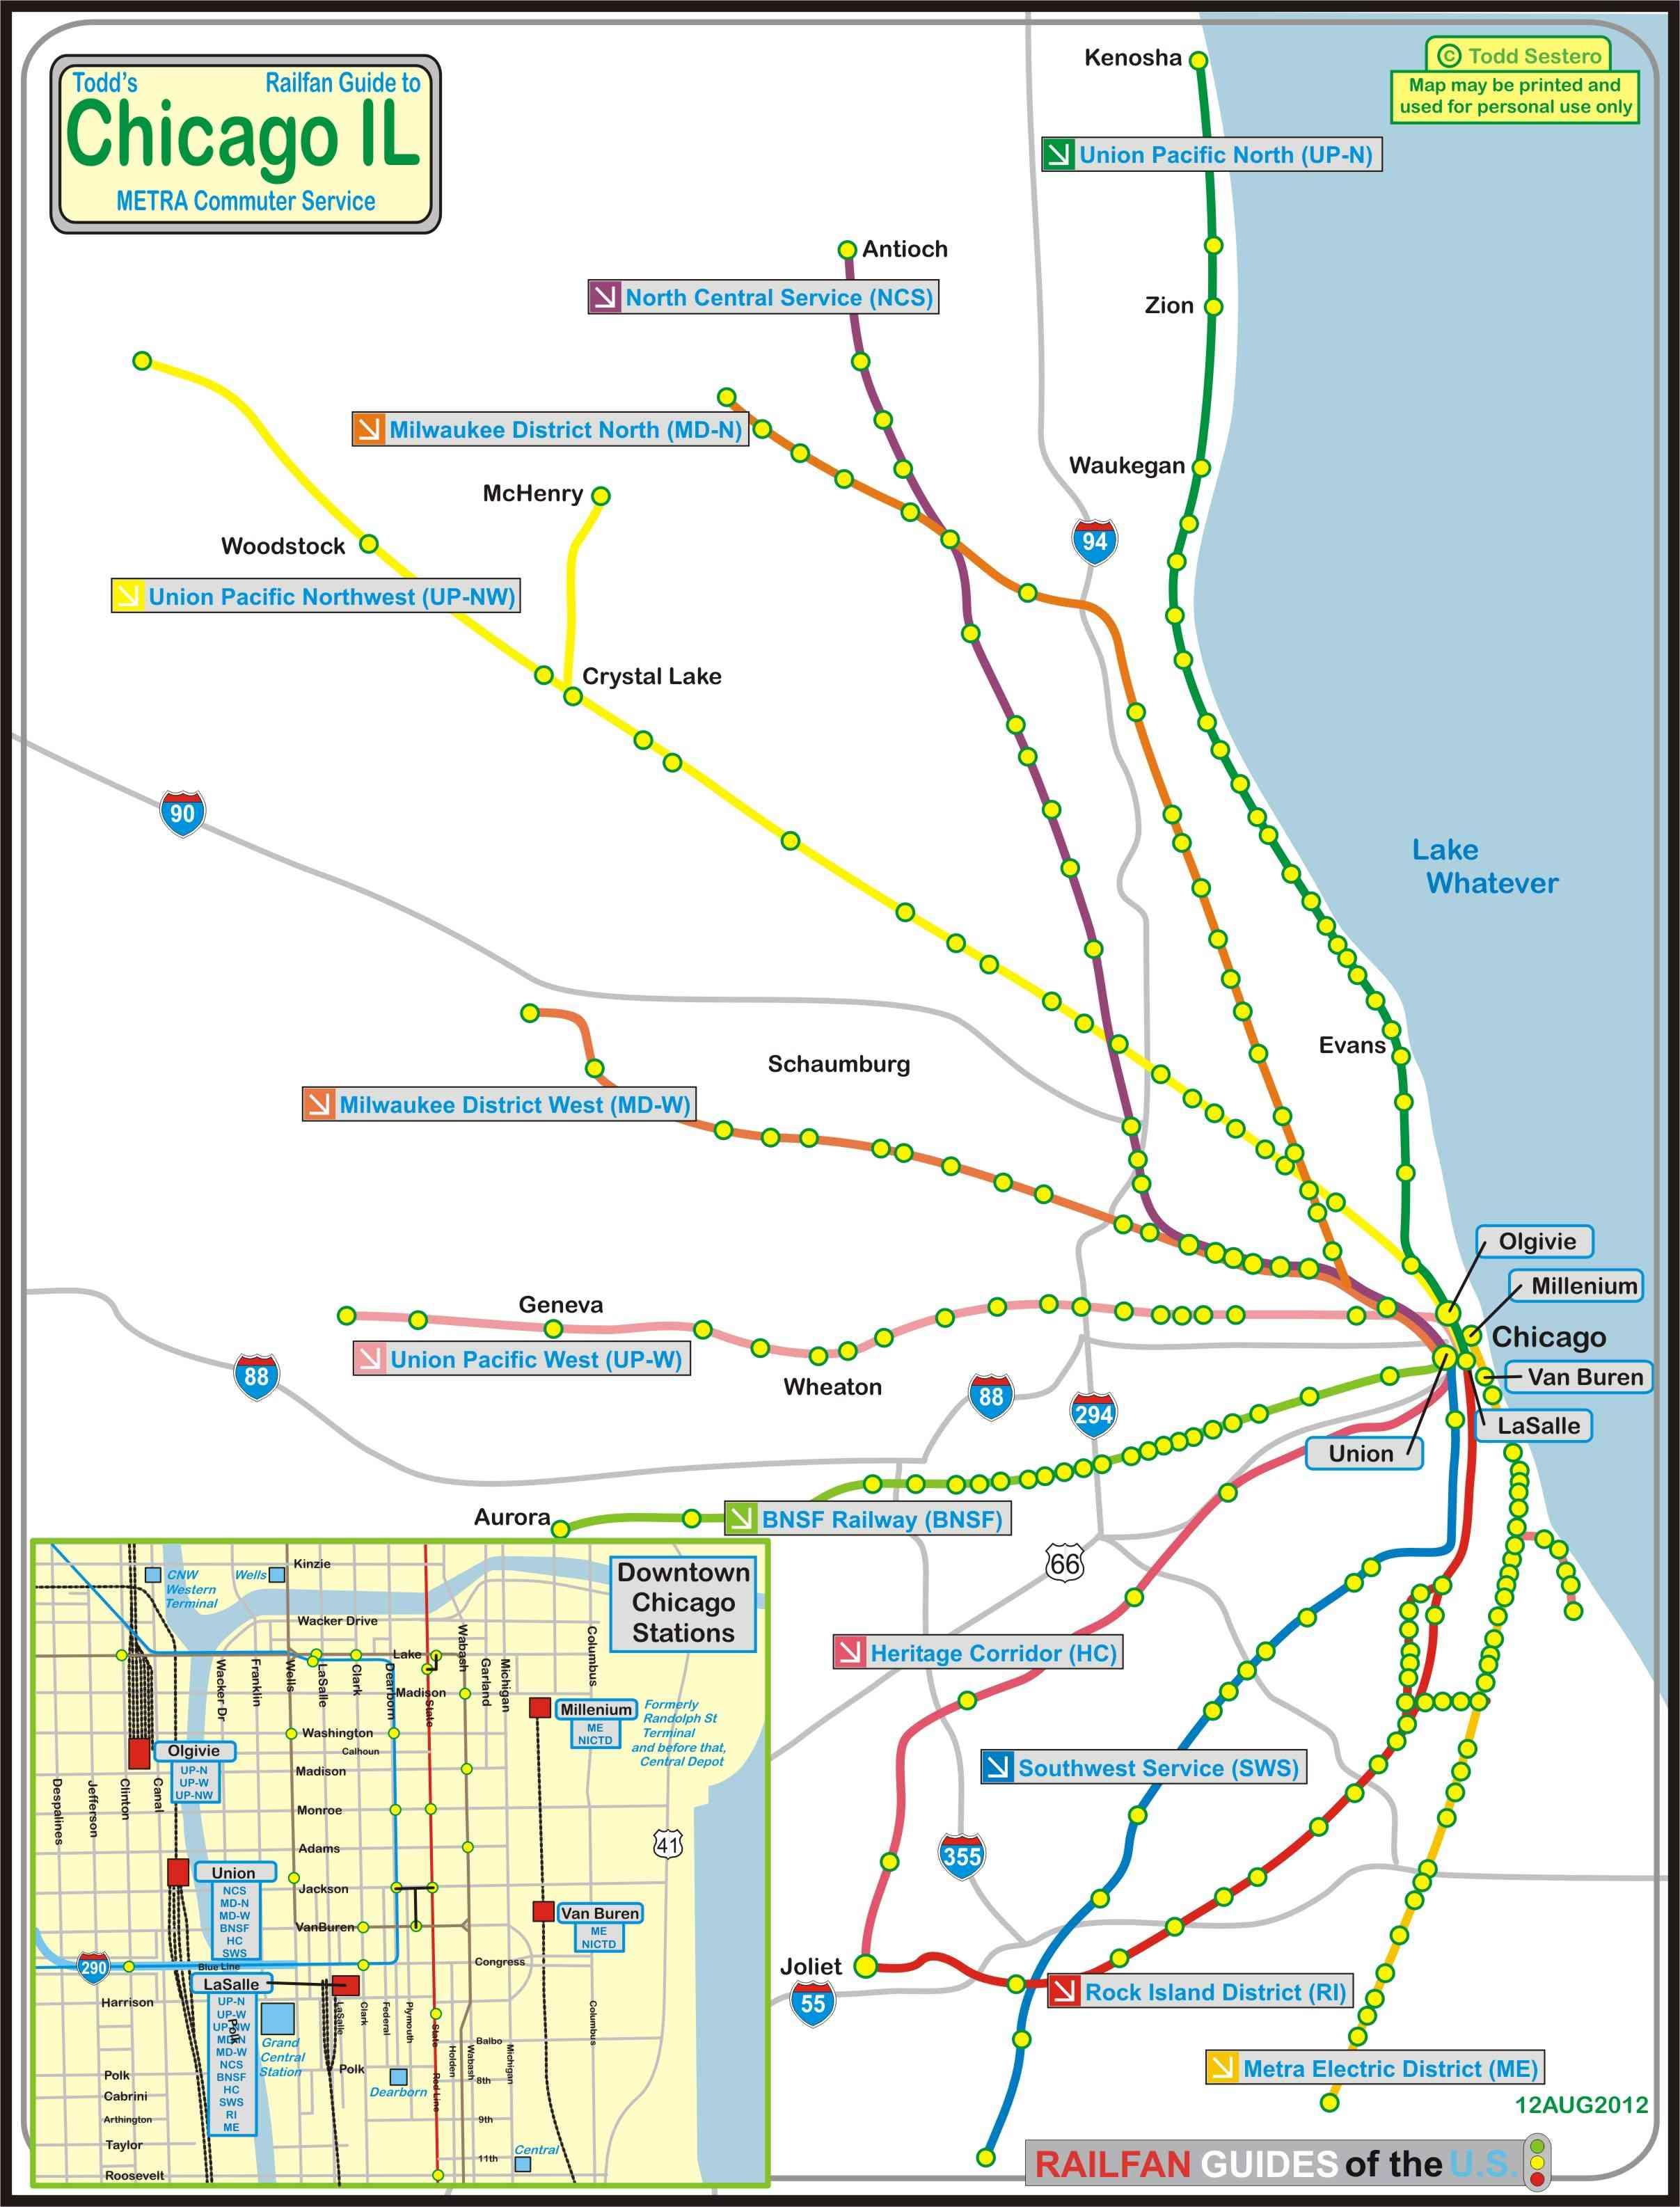 Chicago METRA Railfan Guide